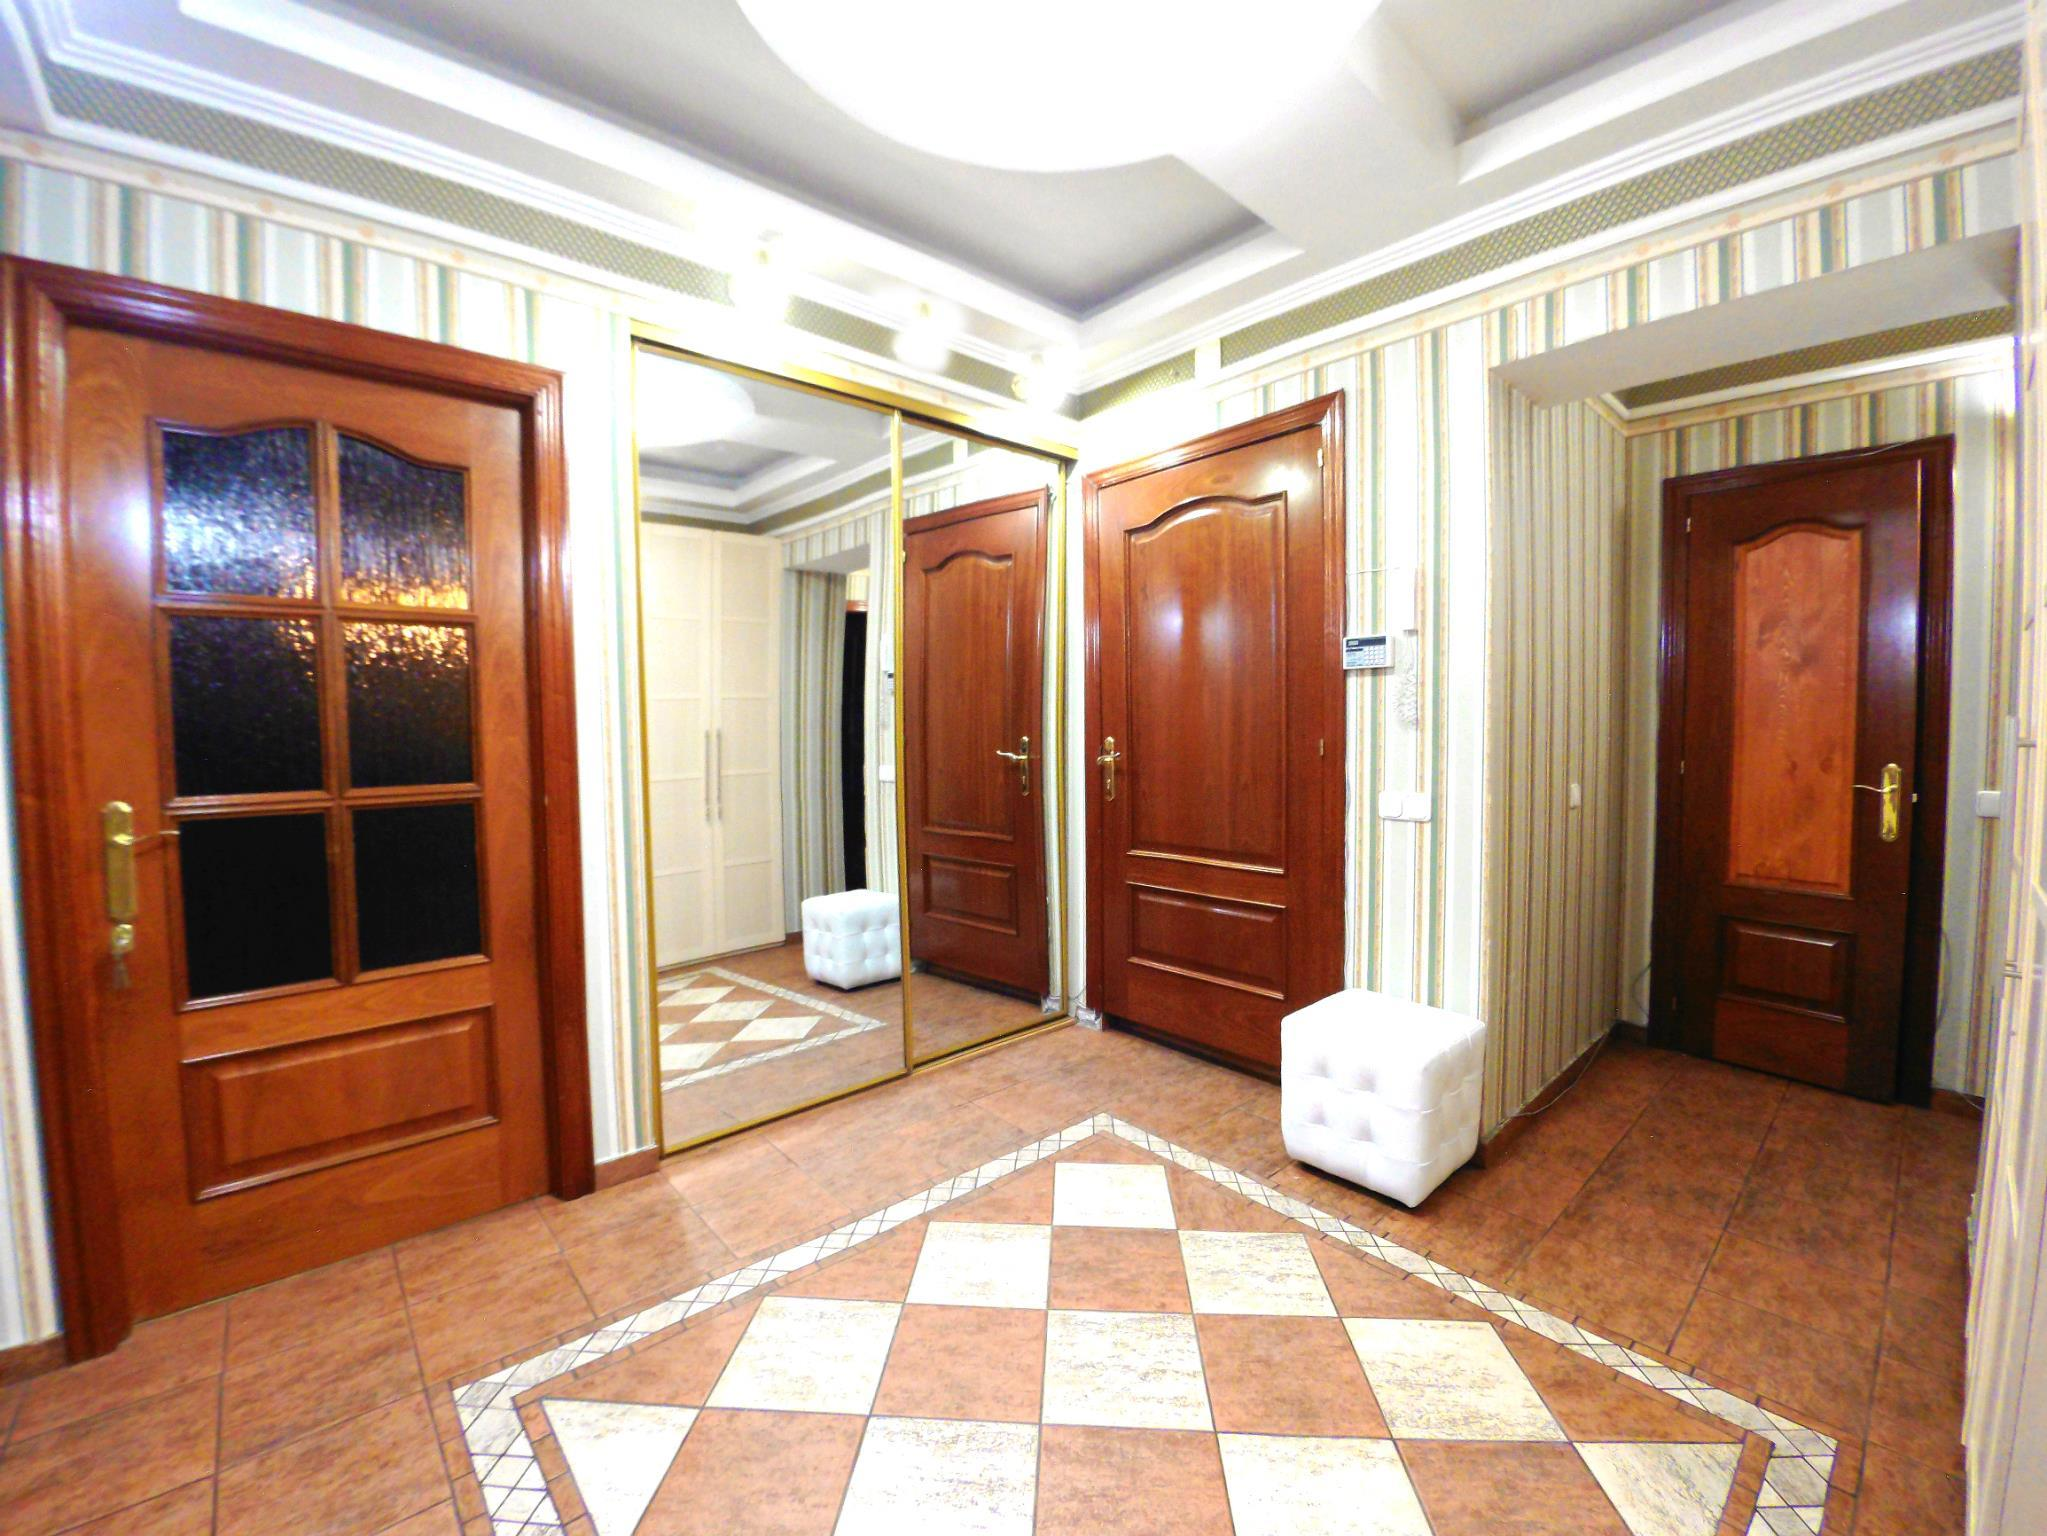 Apartments In Lapin 16 Irkutsk